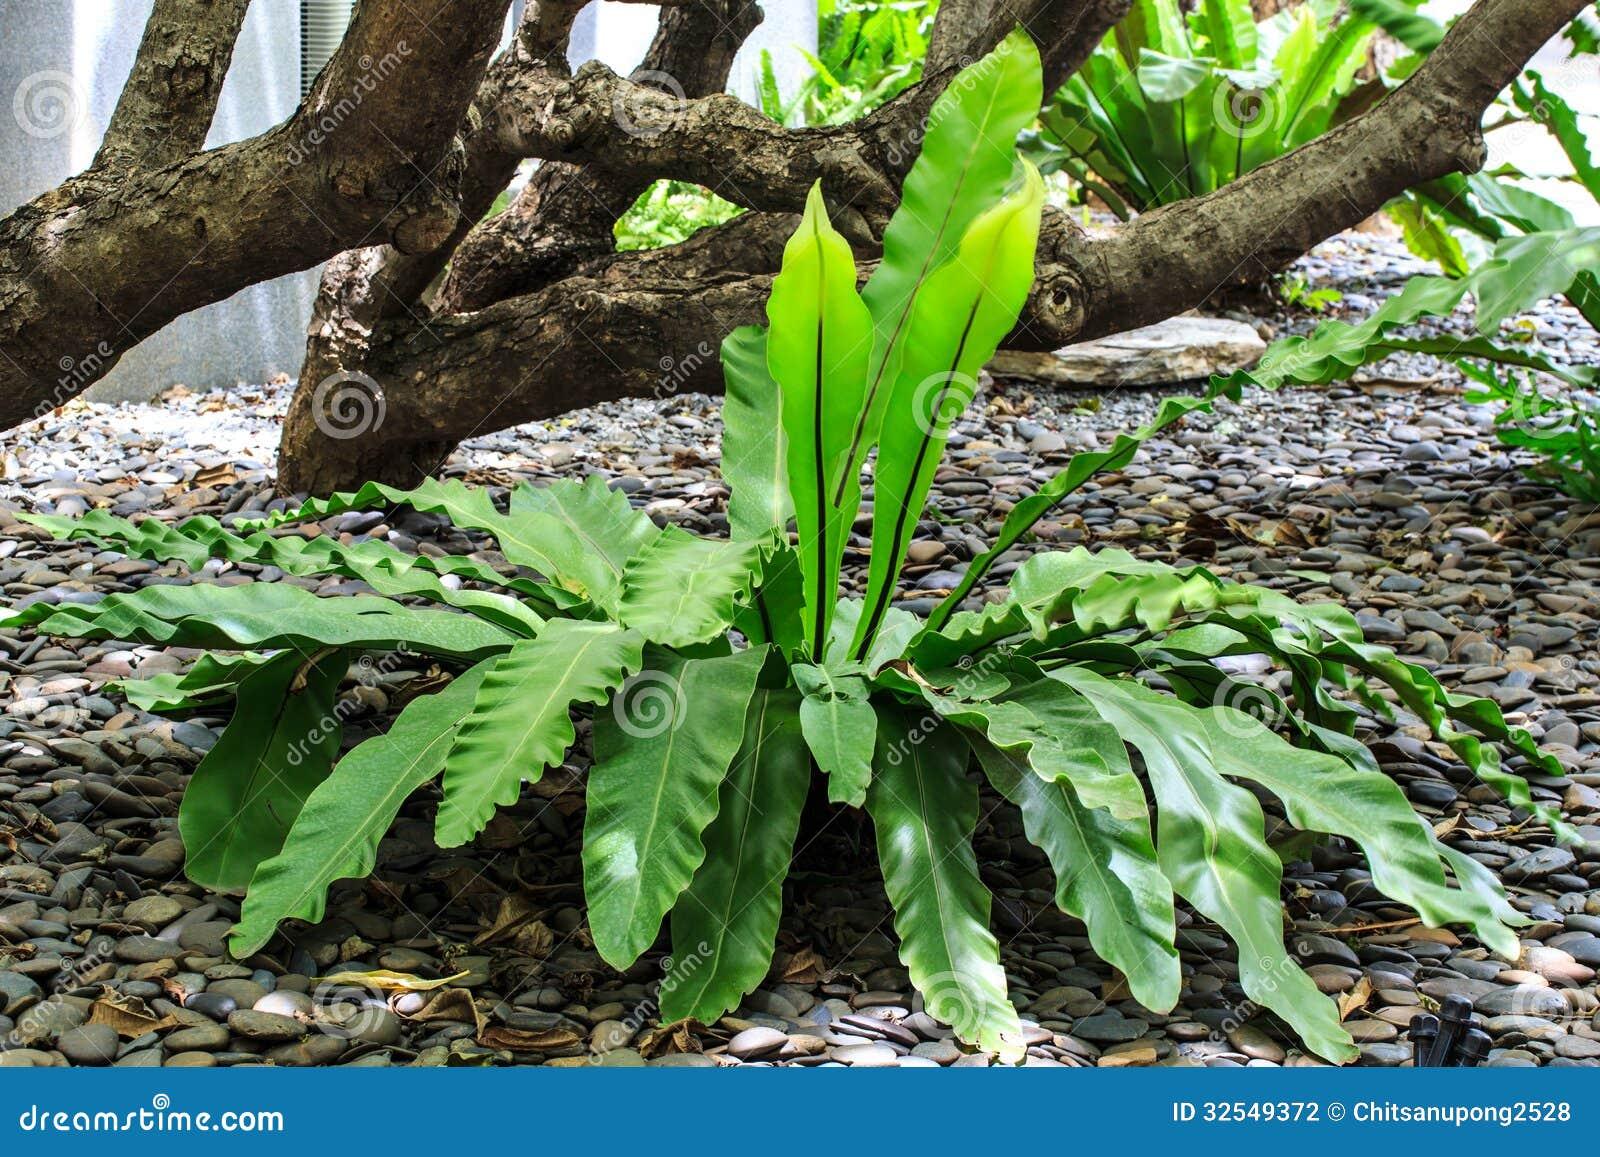 Especie de la planta en bosques tropicales fotograf a de for Plantas ornamentales tropicales